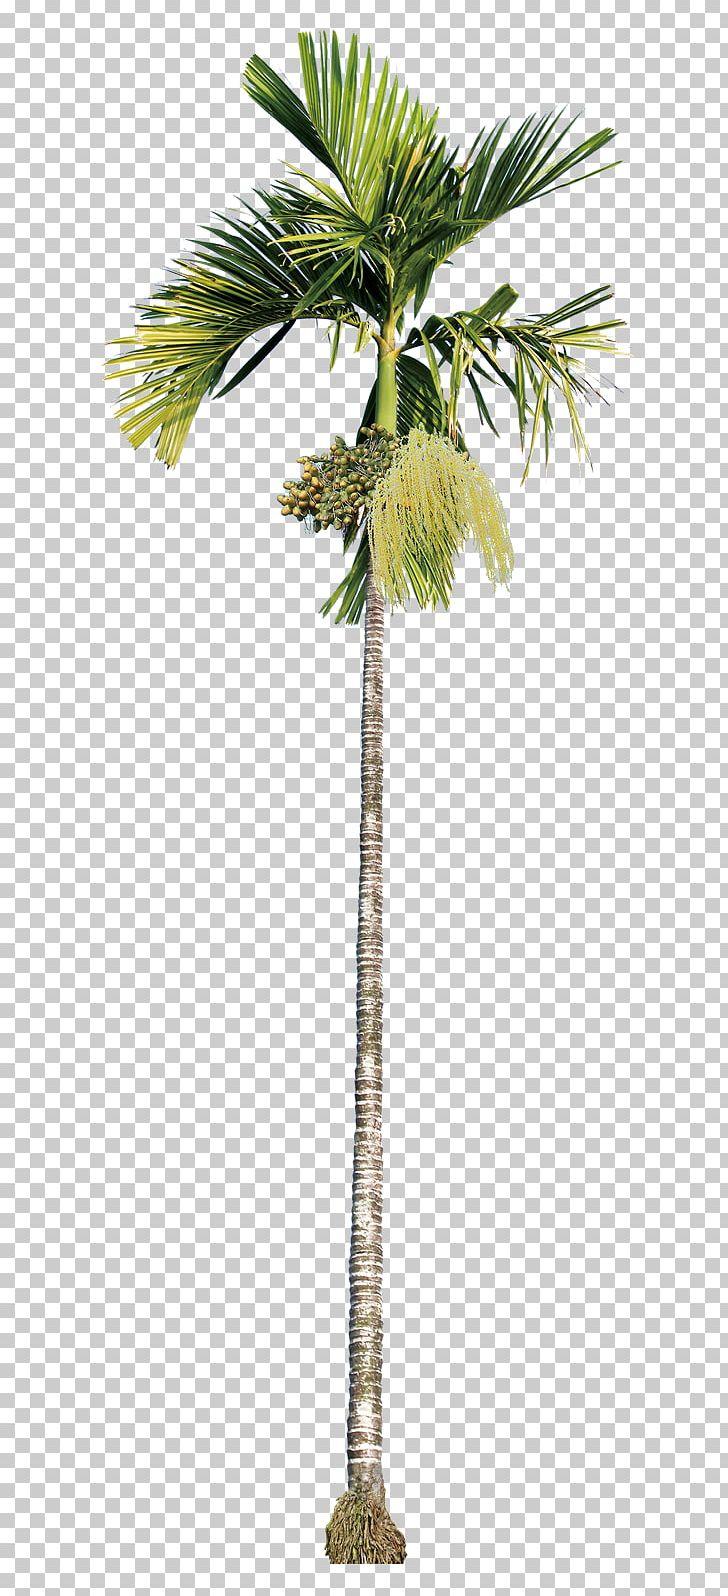 Areca Palm Asian Palmyra Palm Areca Nut Betel Nut Beauty PNG.